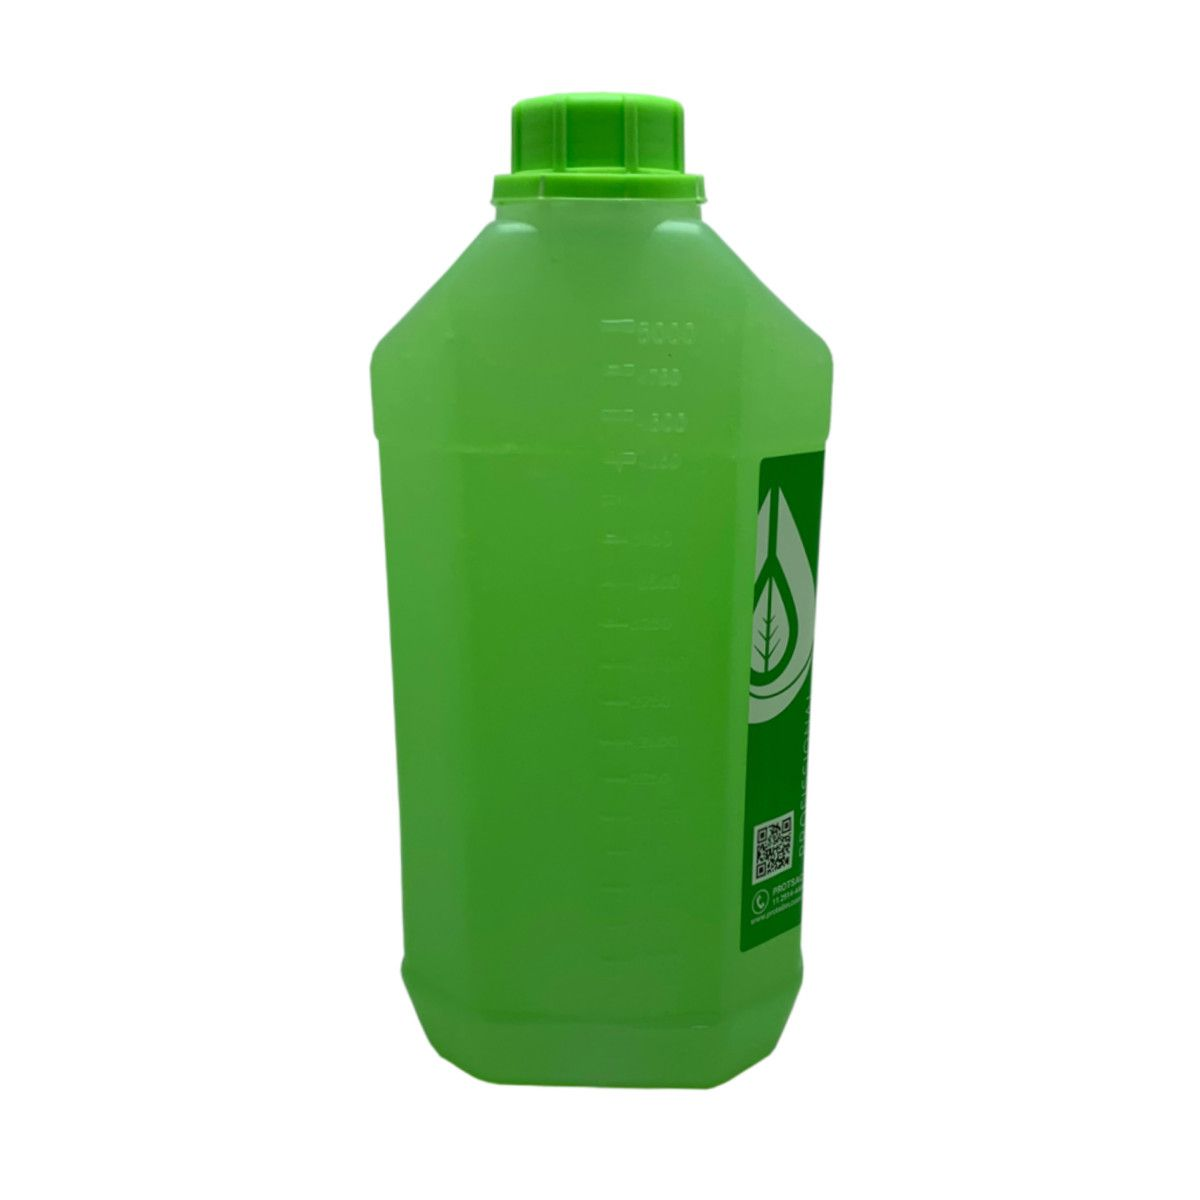 Álcool em Gel 70% Higienizador 8,8L Litros